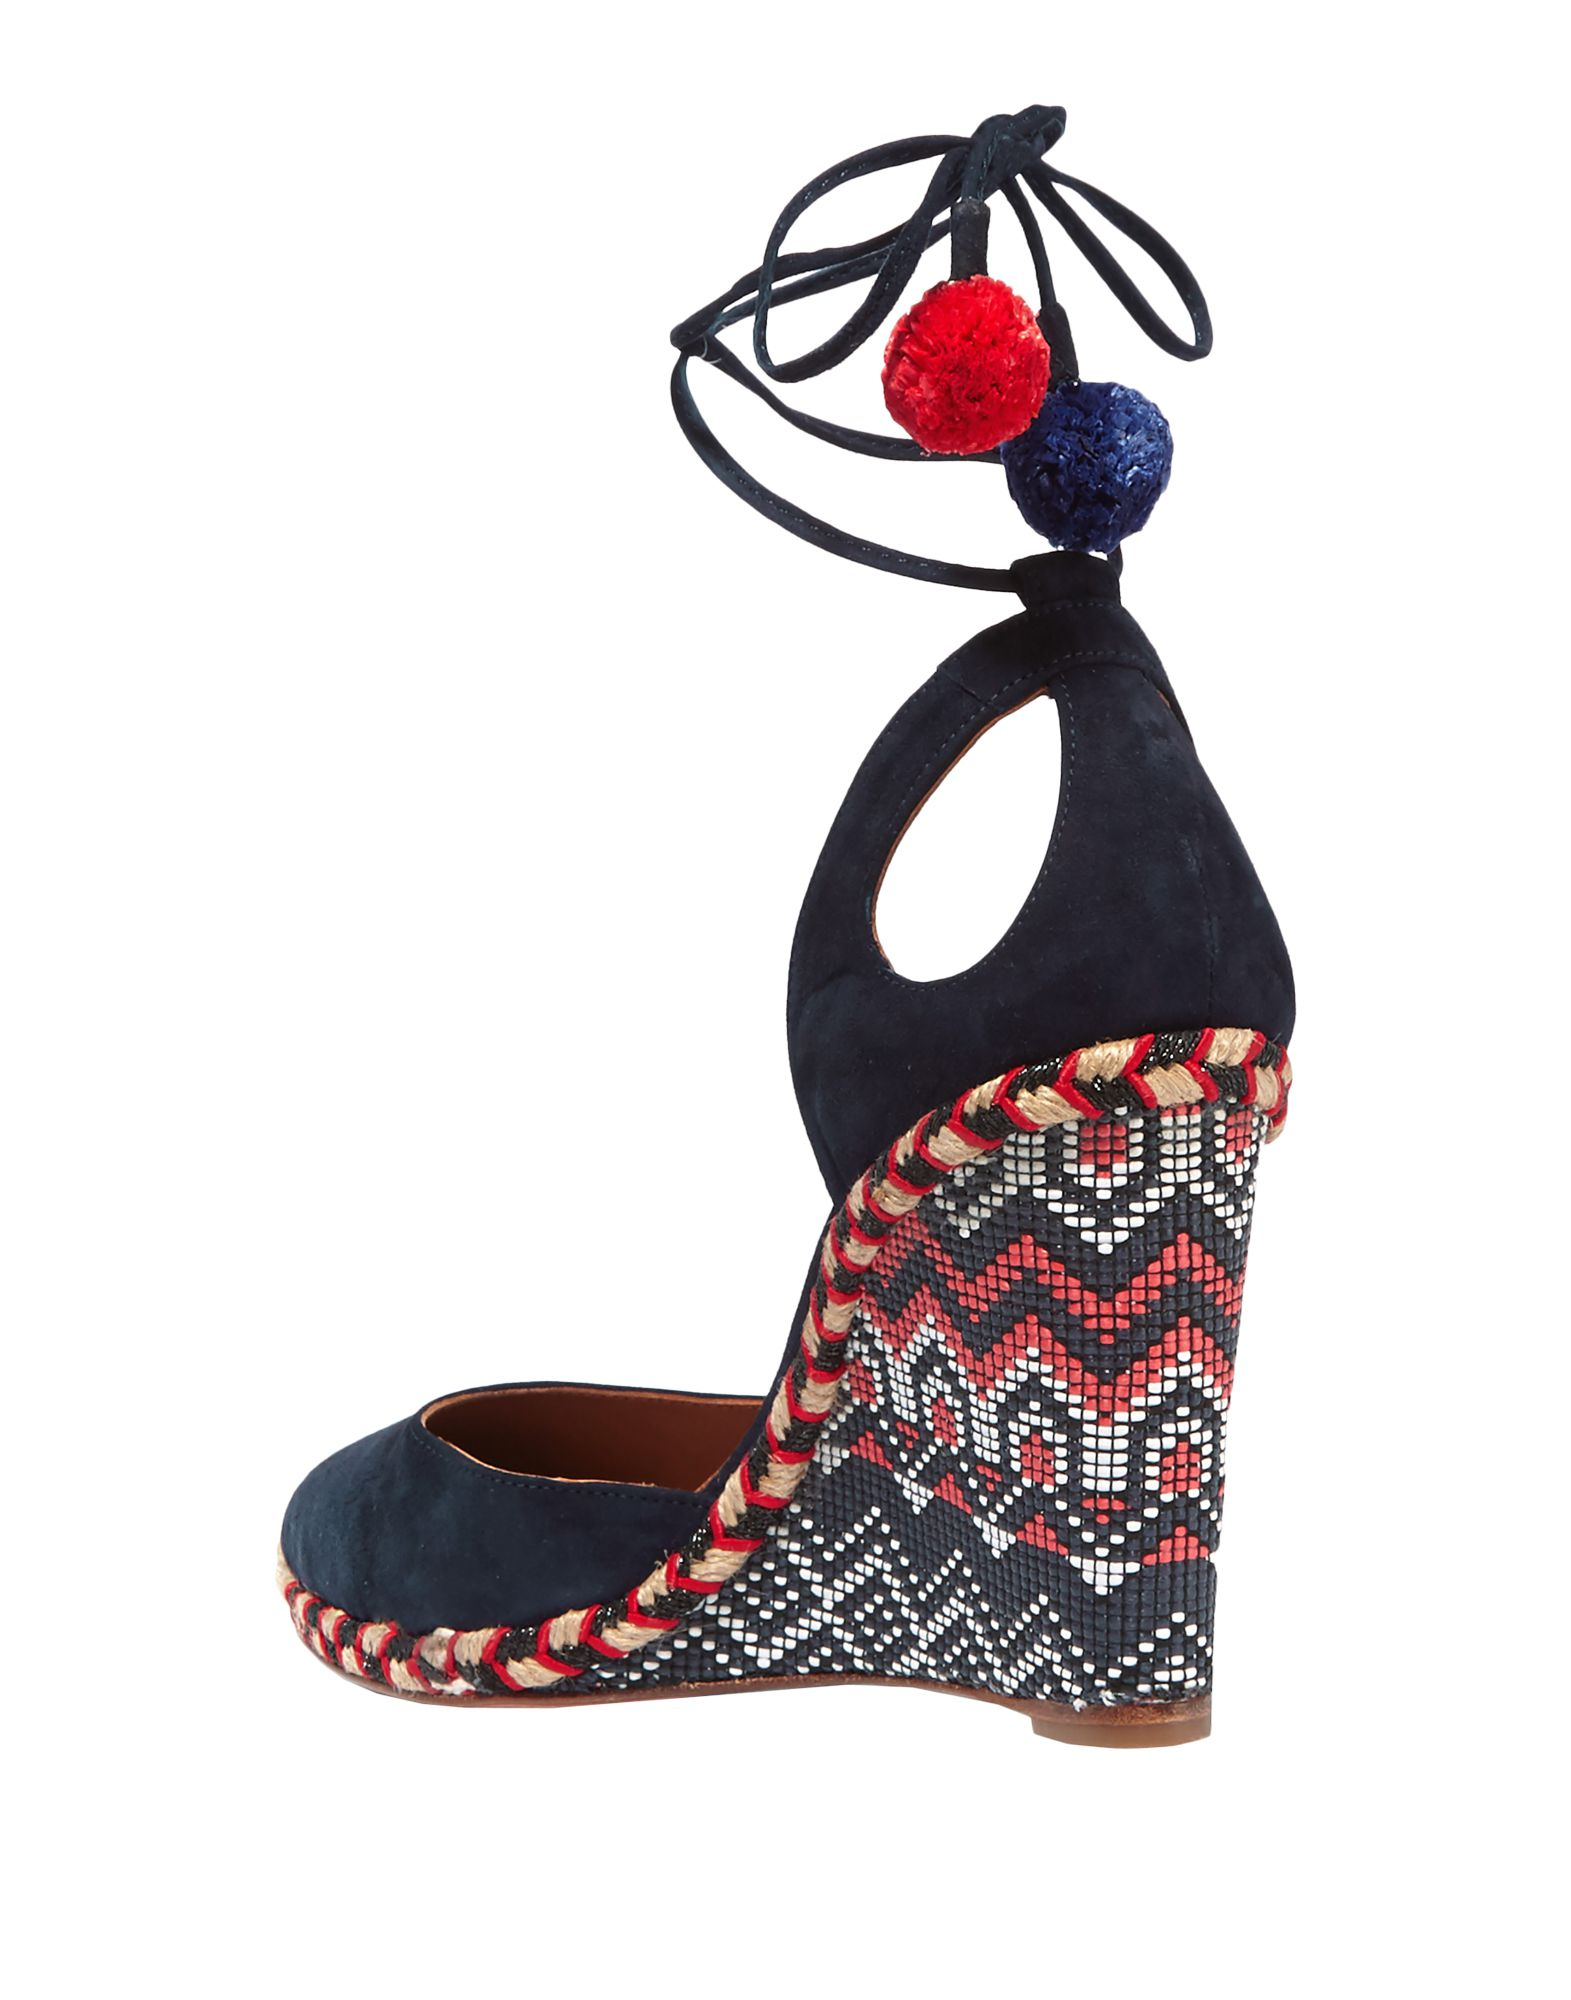 Rabatt Schuhe Aquazzura Damen Espadrilles Damen Aquazzura  11174078XW c4d74f